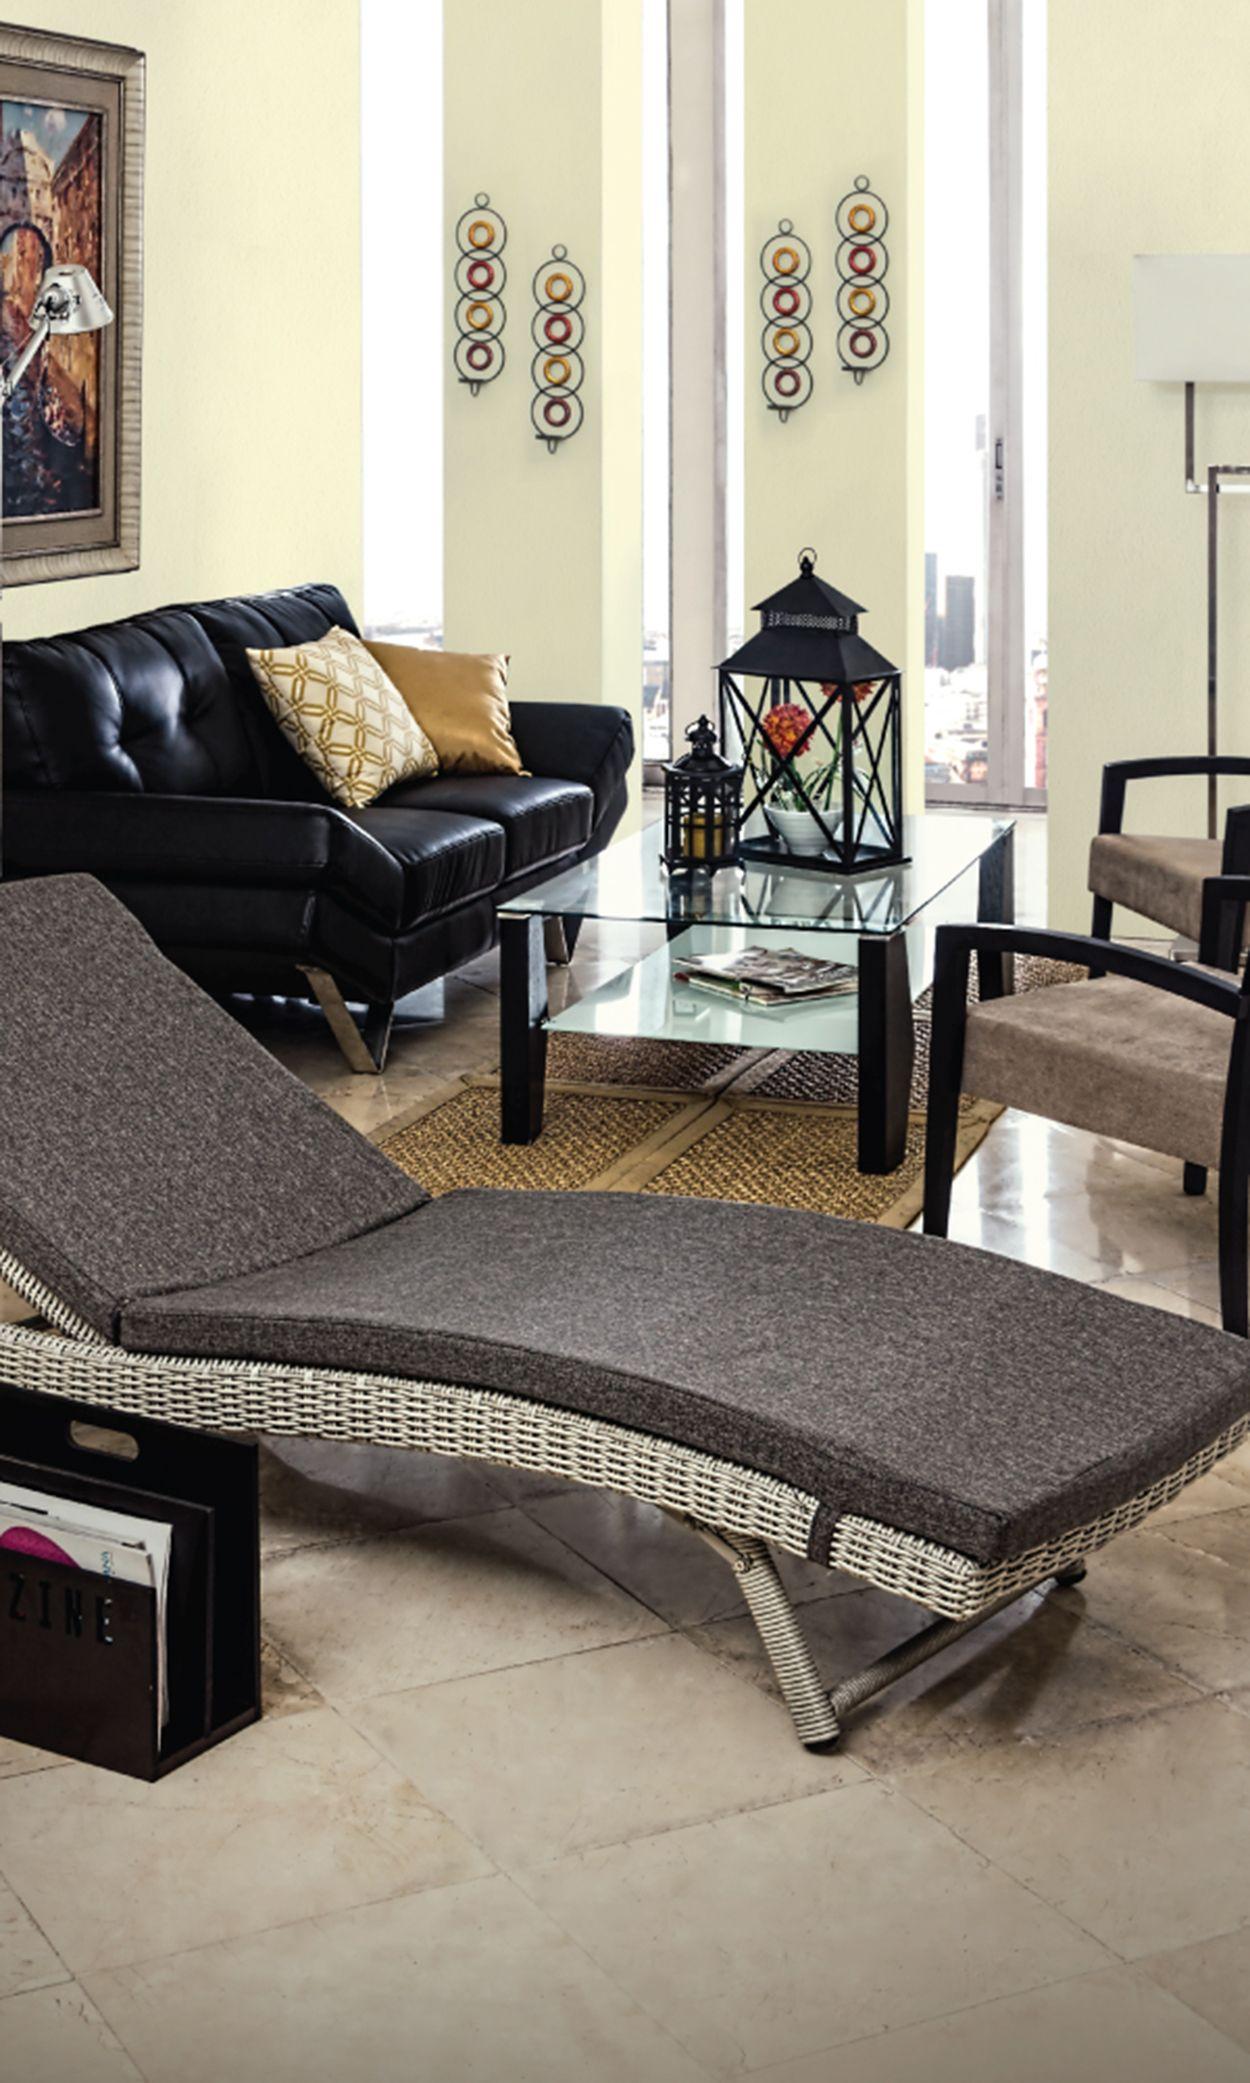 Moderno Sala Descanso Decoraci N Confort Relax Moda  # Muebles De Sala Fucsia